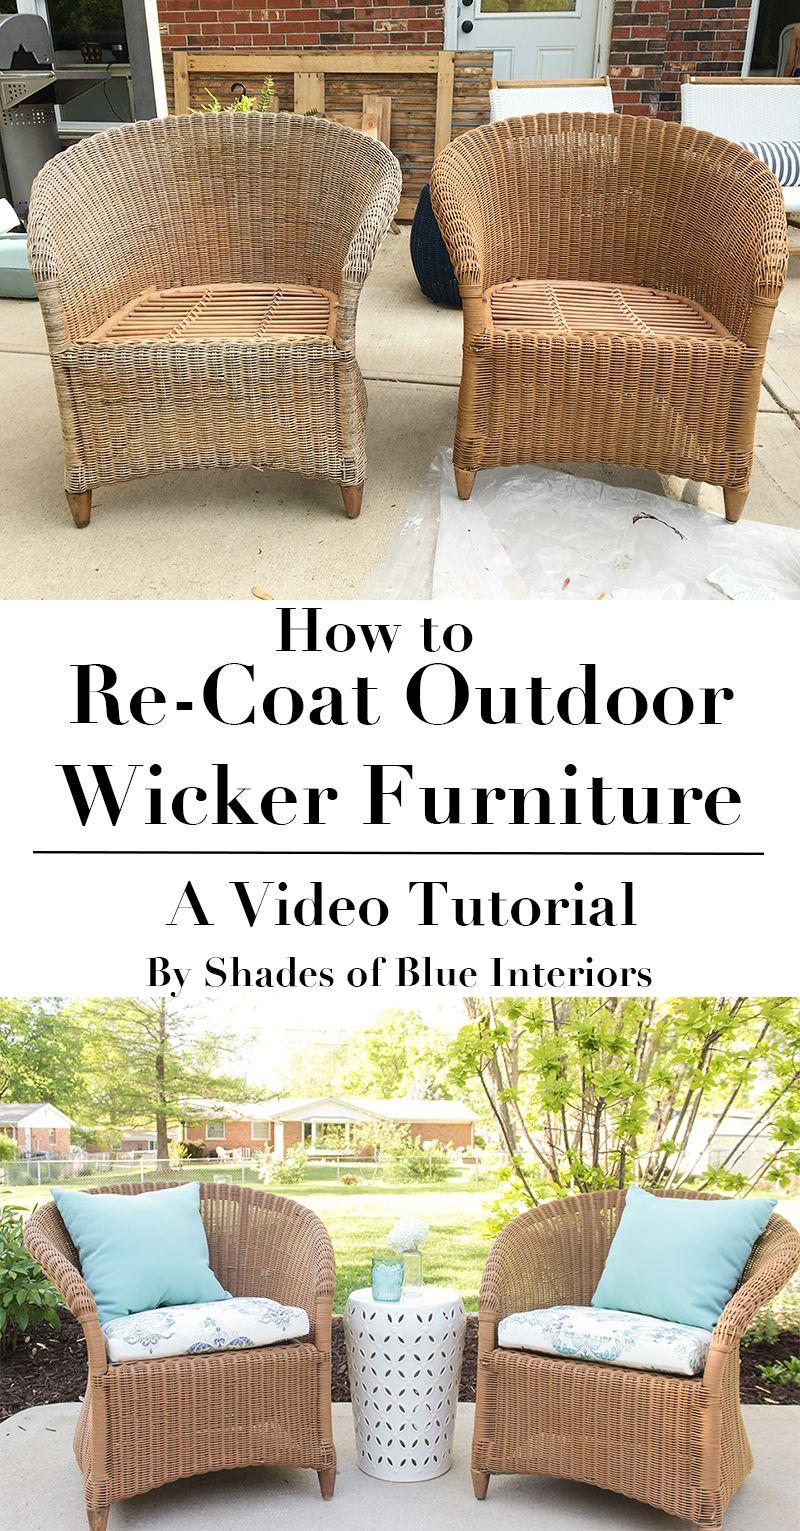 How To Re Coat Wicker Furniture Wicker Patio Furniture Outdoor Wicker Furniture Furniture Makeover